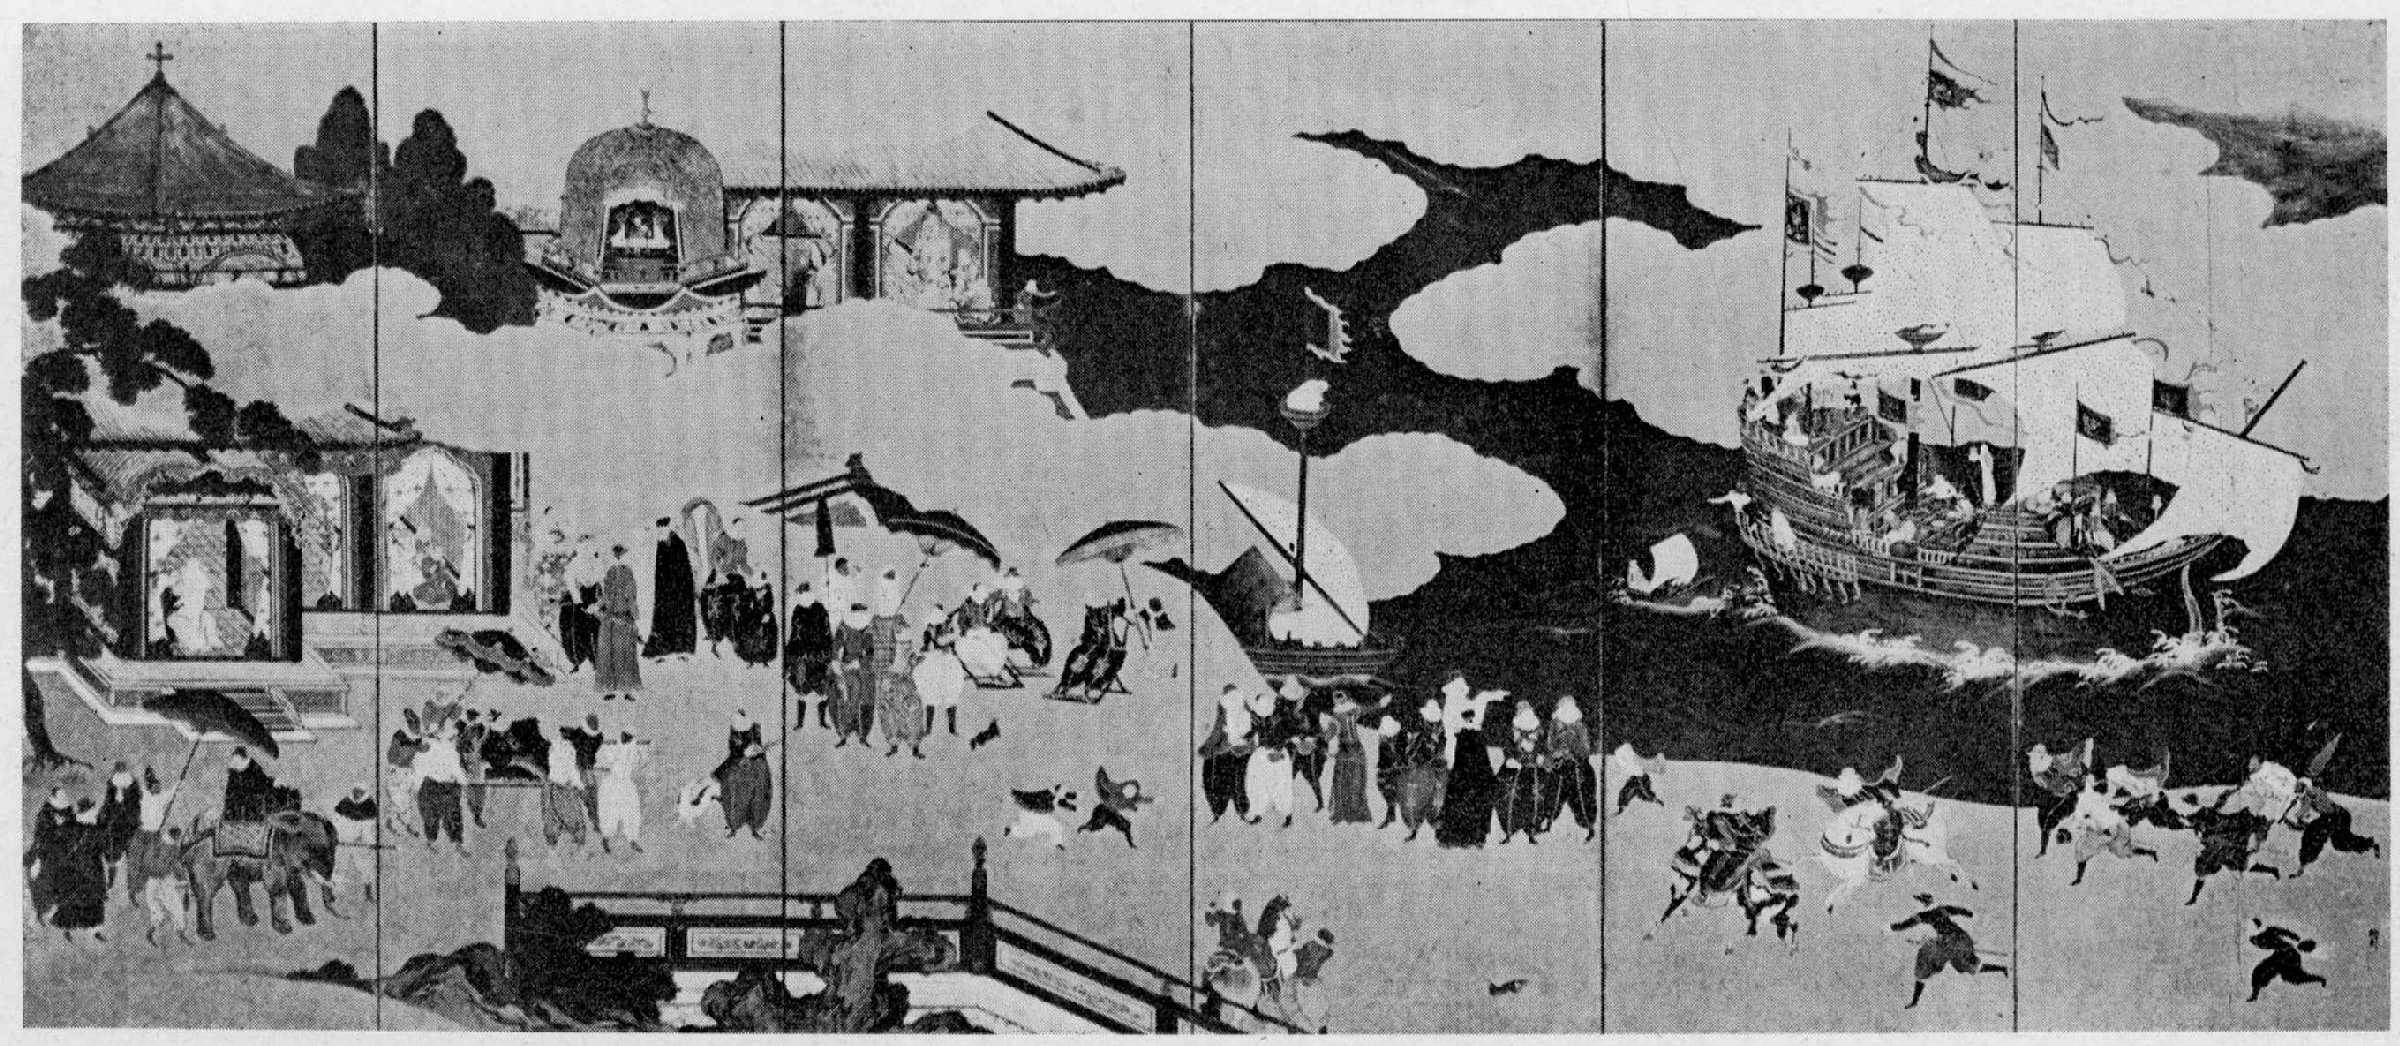 狩野内膳の画像 p1_1